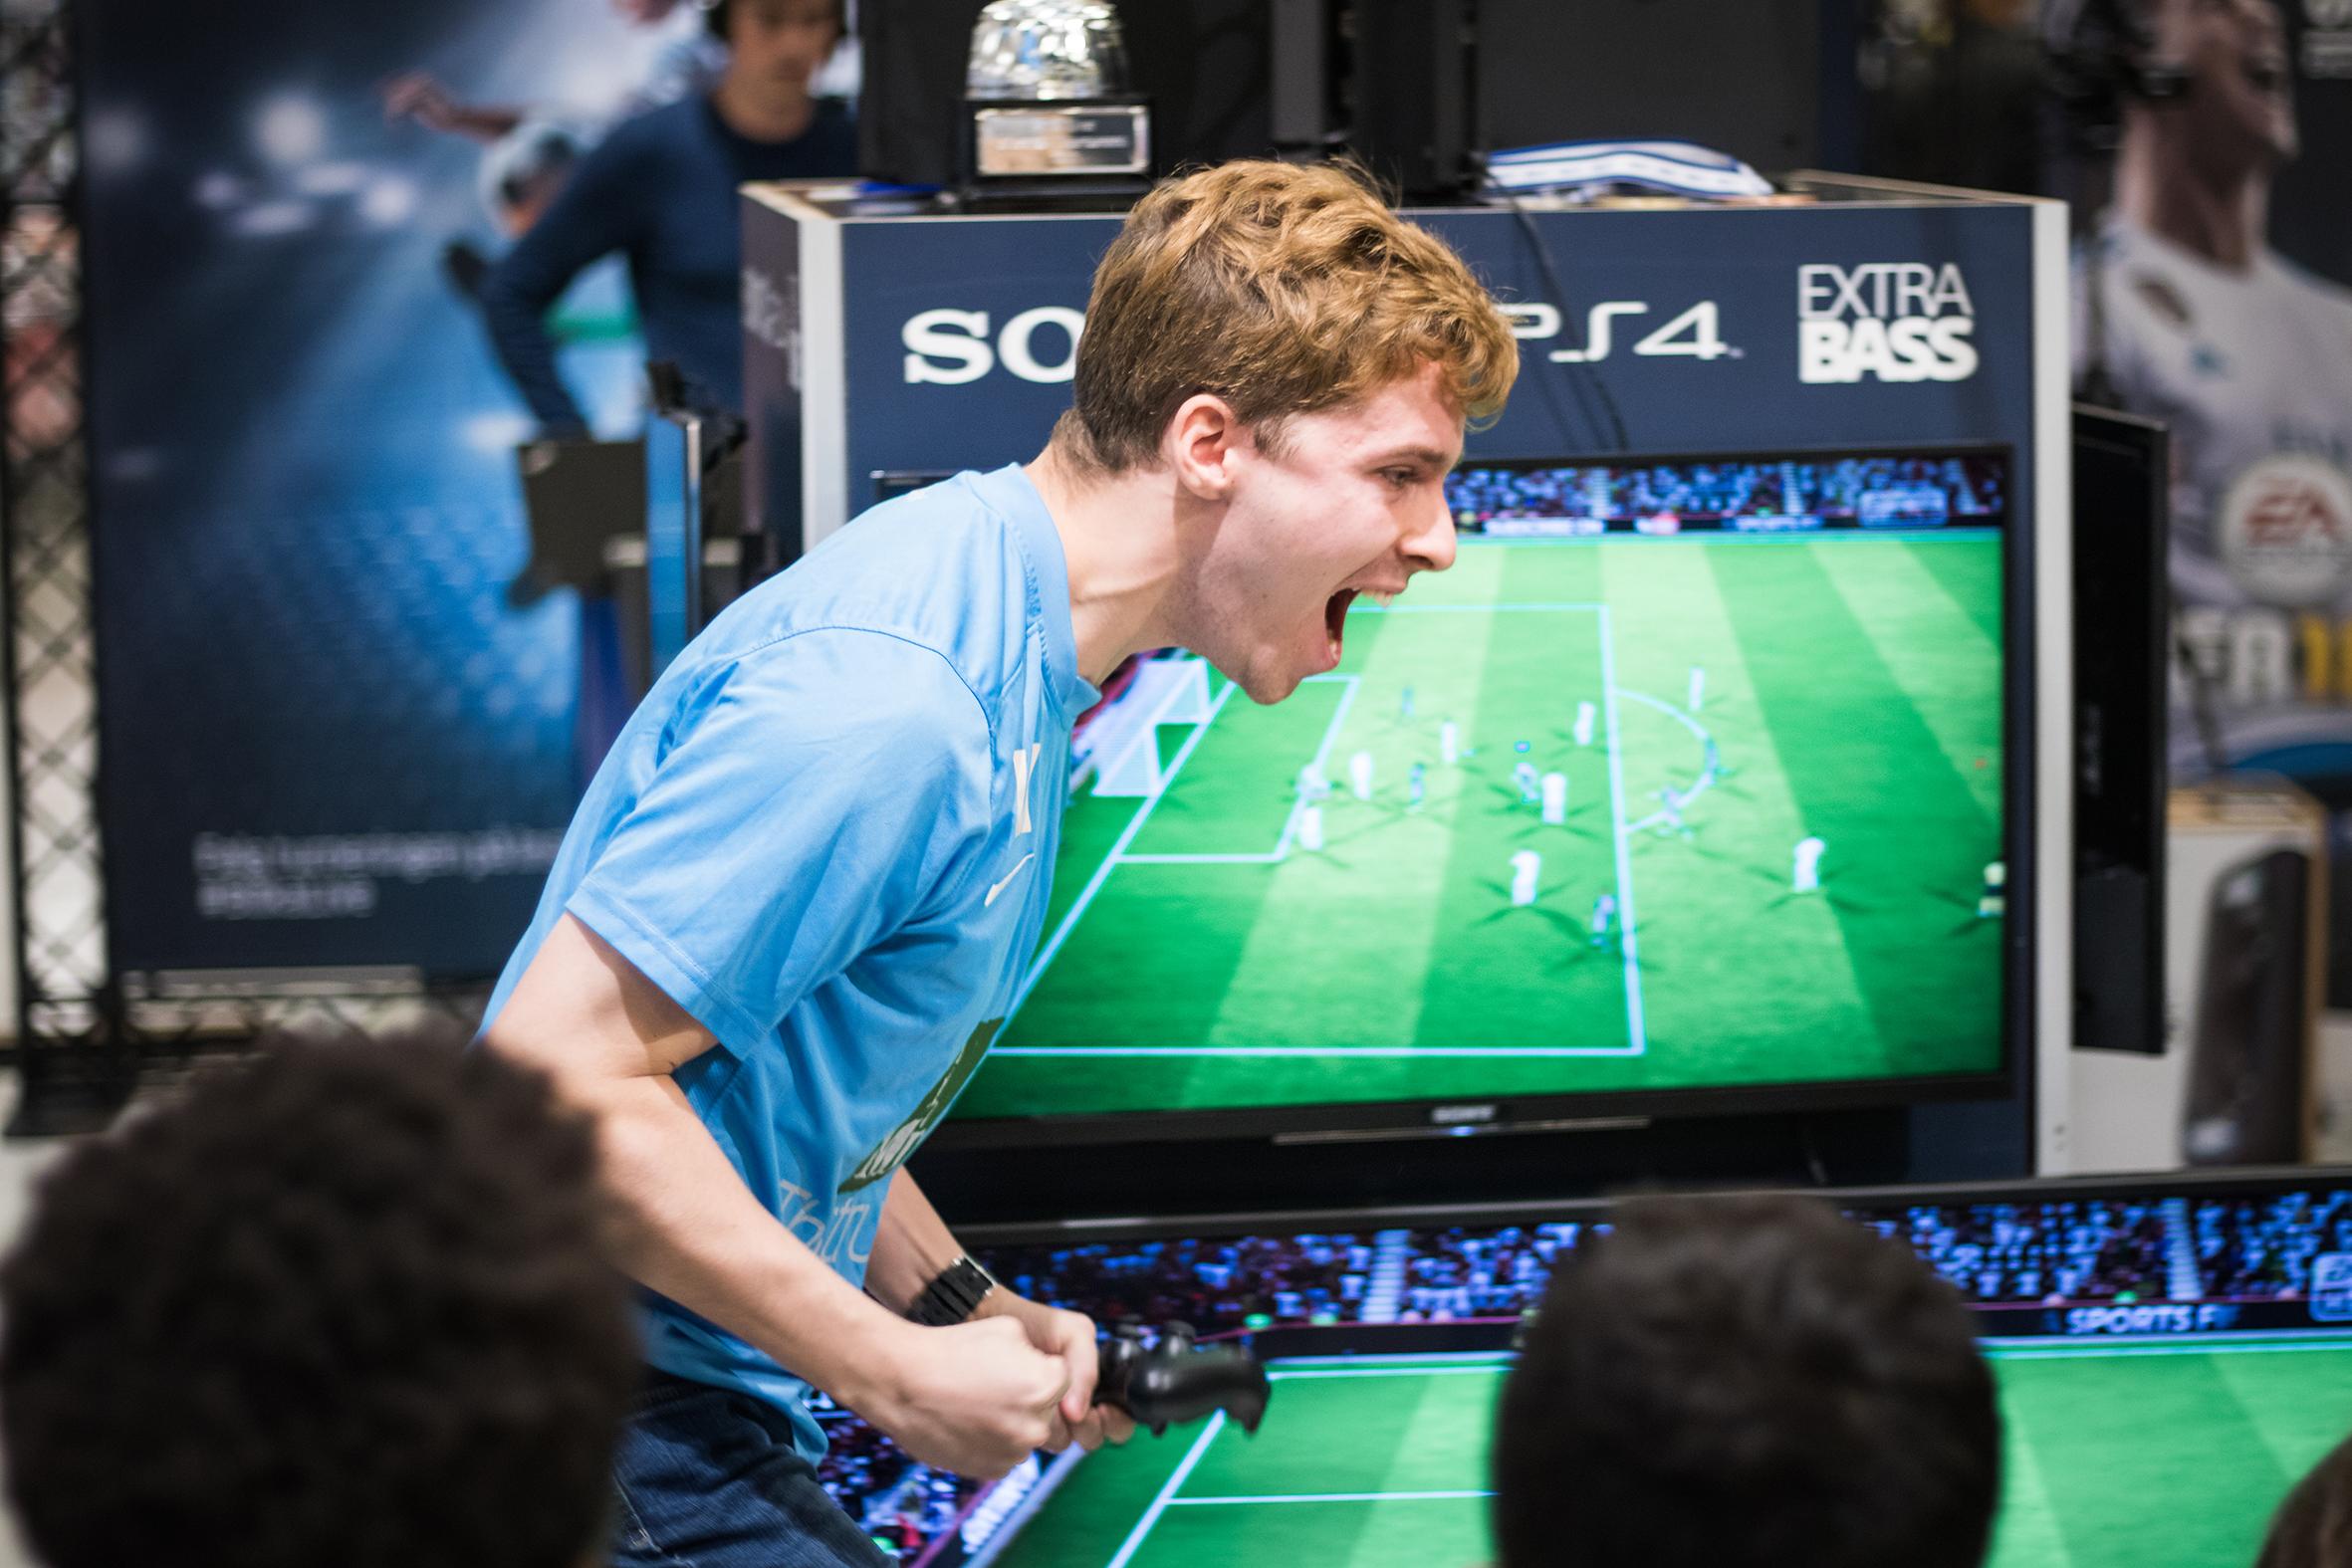 Kæmpe satsning: Aalborg får gigantisk spilfestival